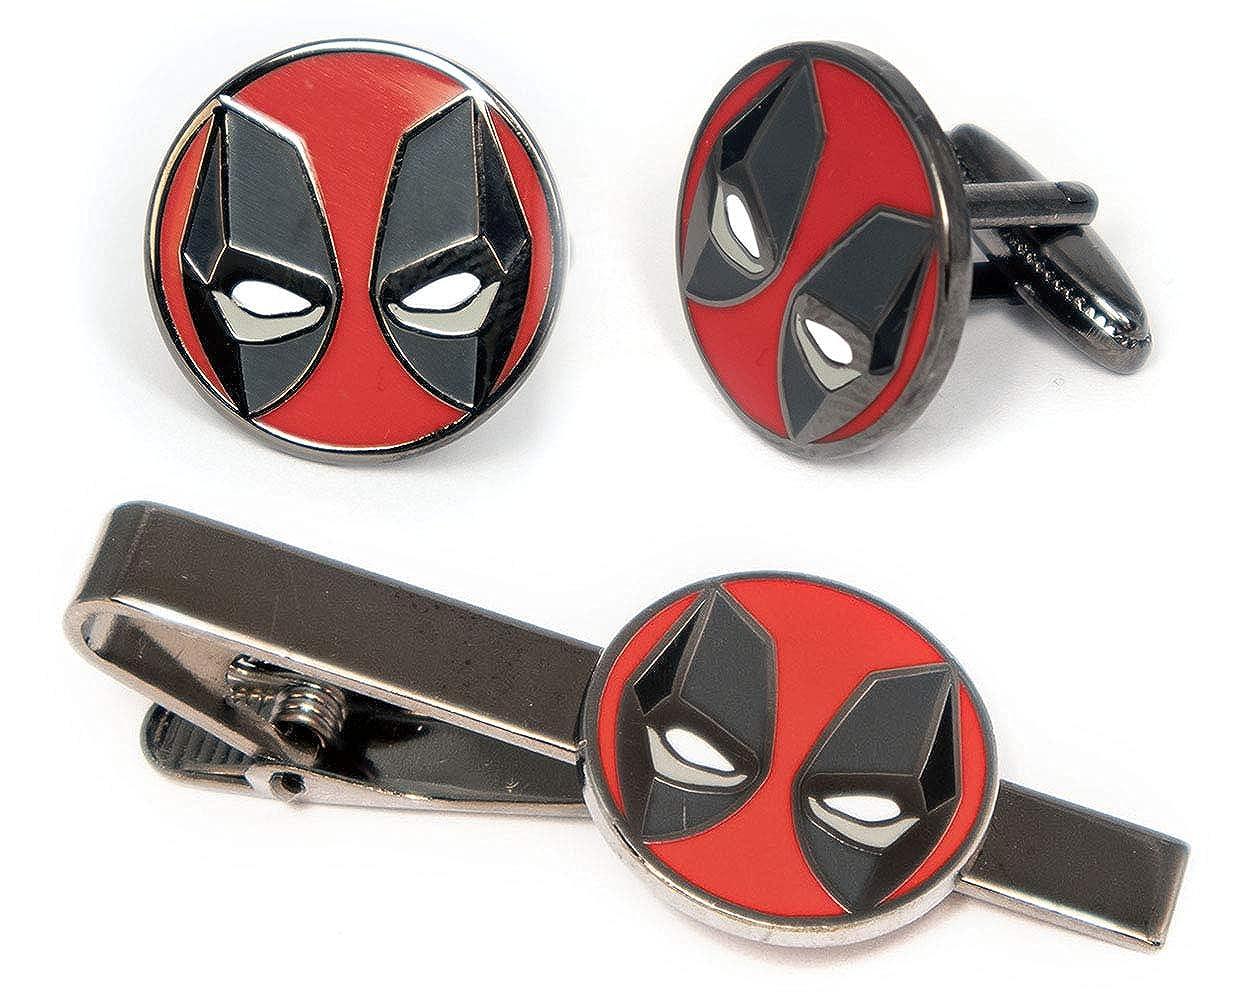 Marvel Minimalist Jewelry Wolverine Cuff Links Link Cable Tie Tack Groomsmen Wedding Party Gift The X-Men Cufflinks SharedImagination Deadpool Cufflinks The X-Men Tie Clip